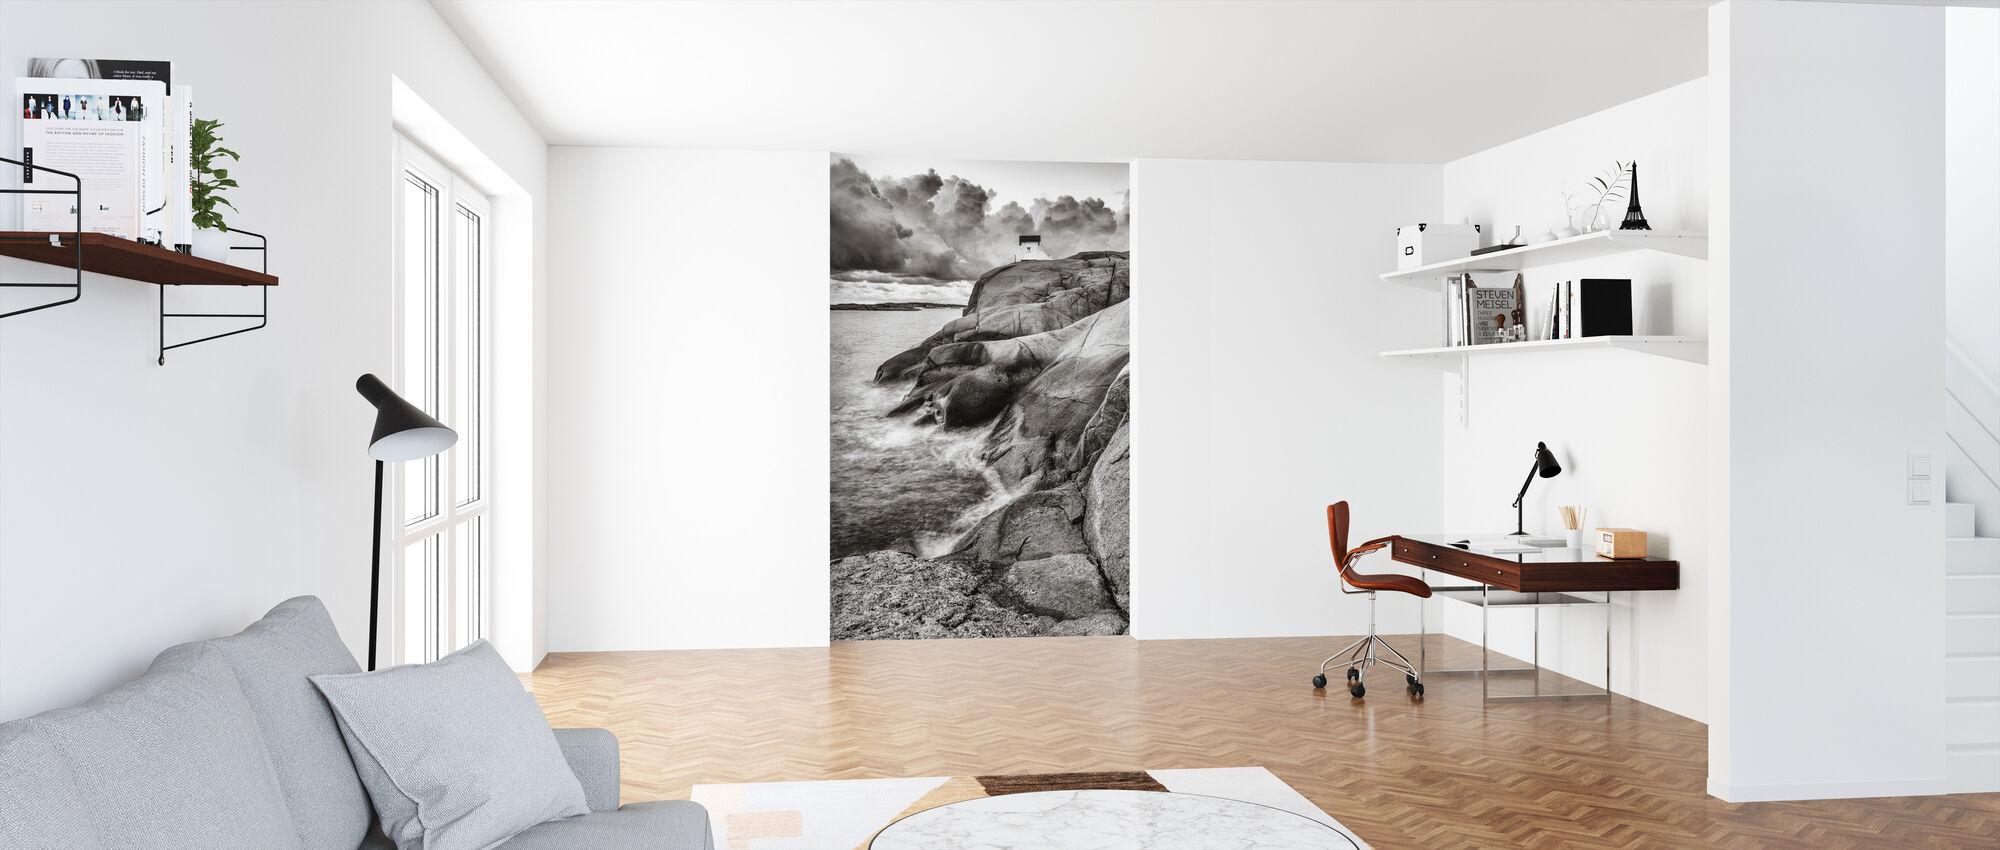 Rocks - Wallpaper - Office